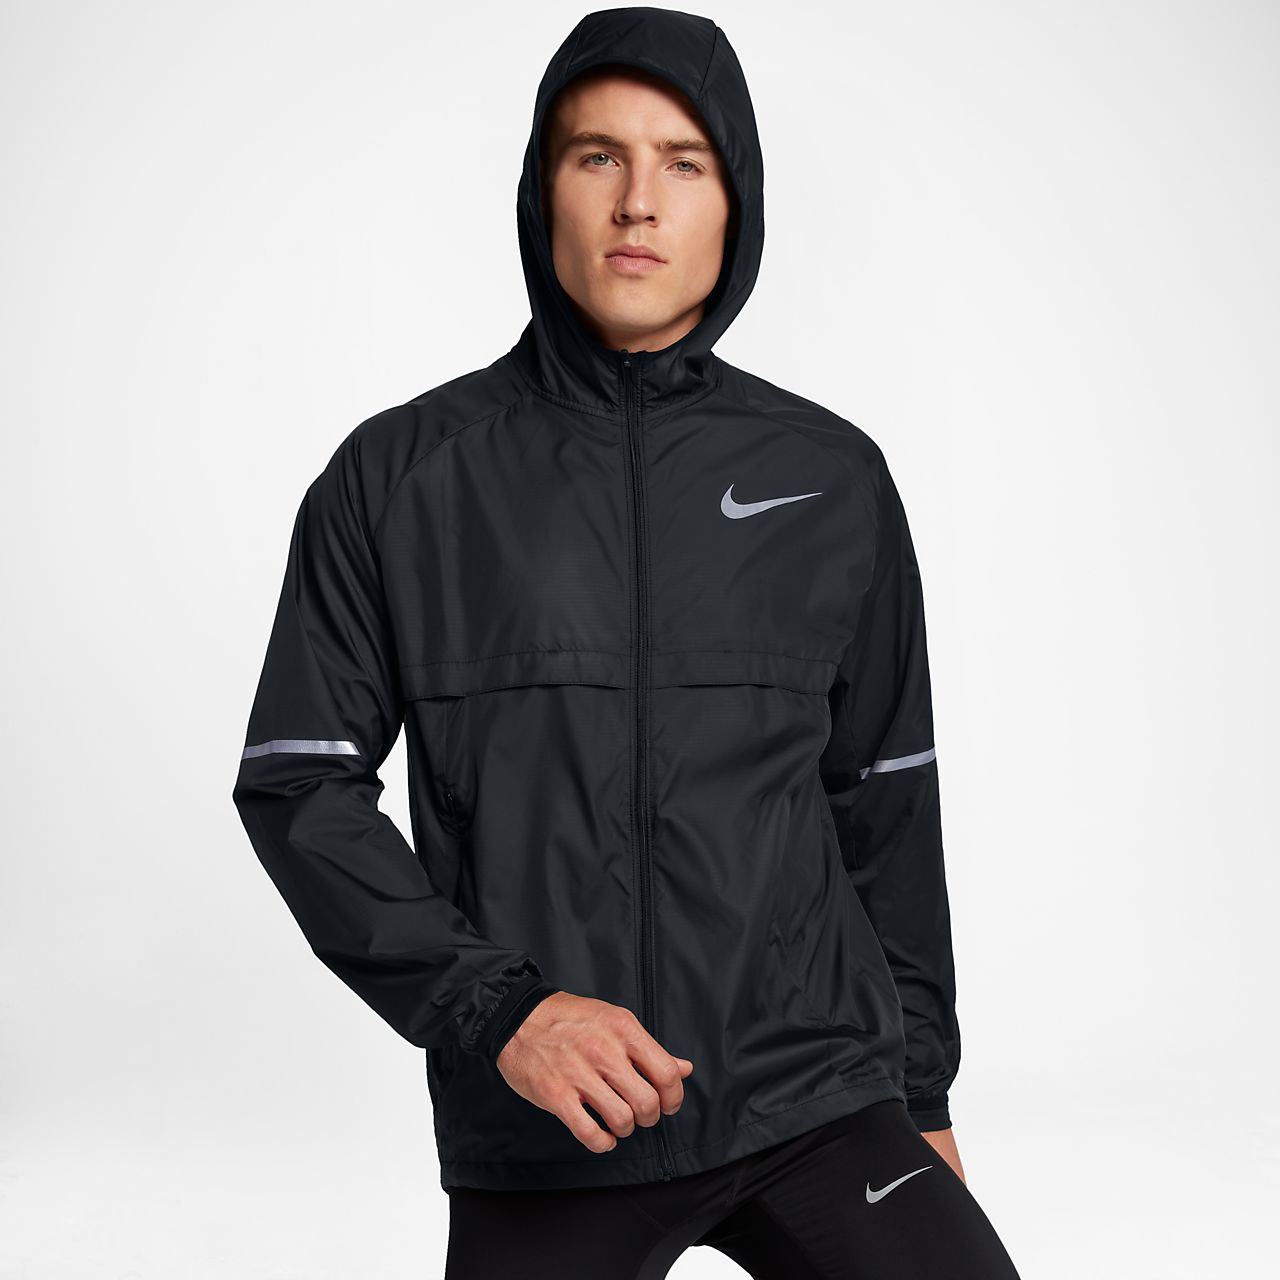 ... Nike Shield Men's Running Jacket